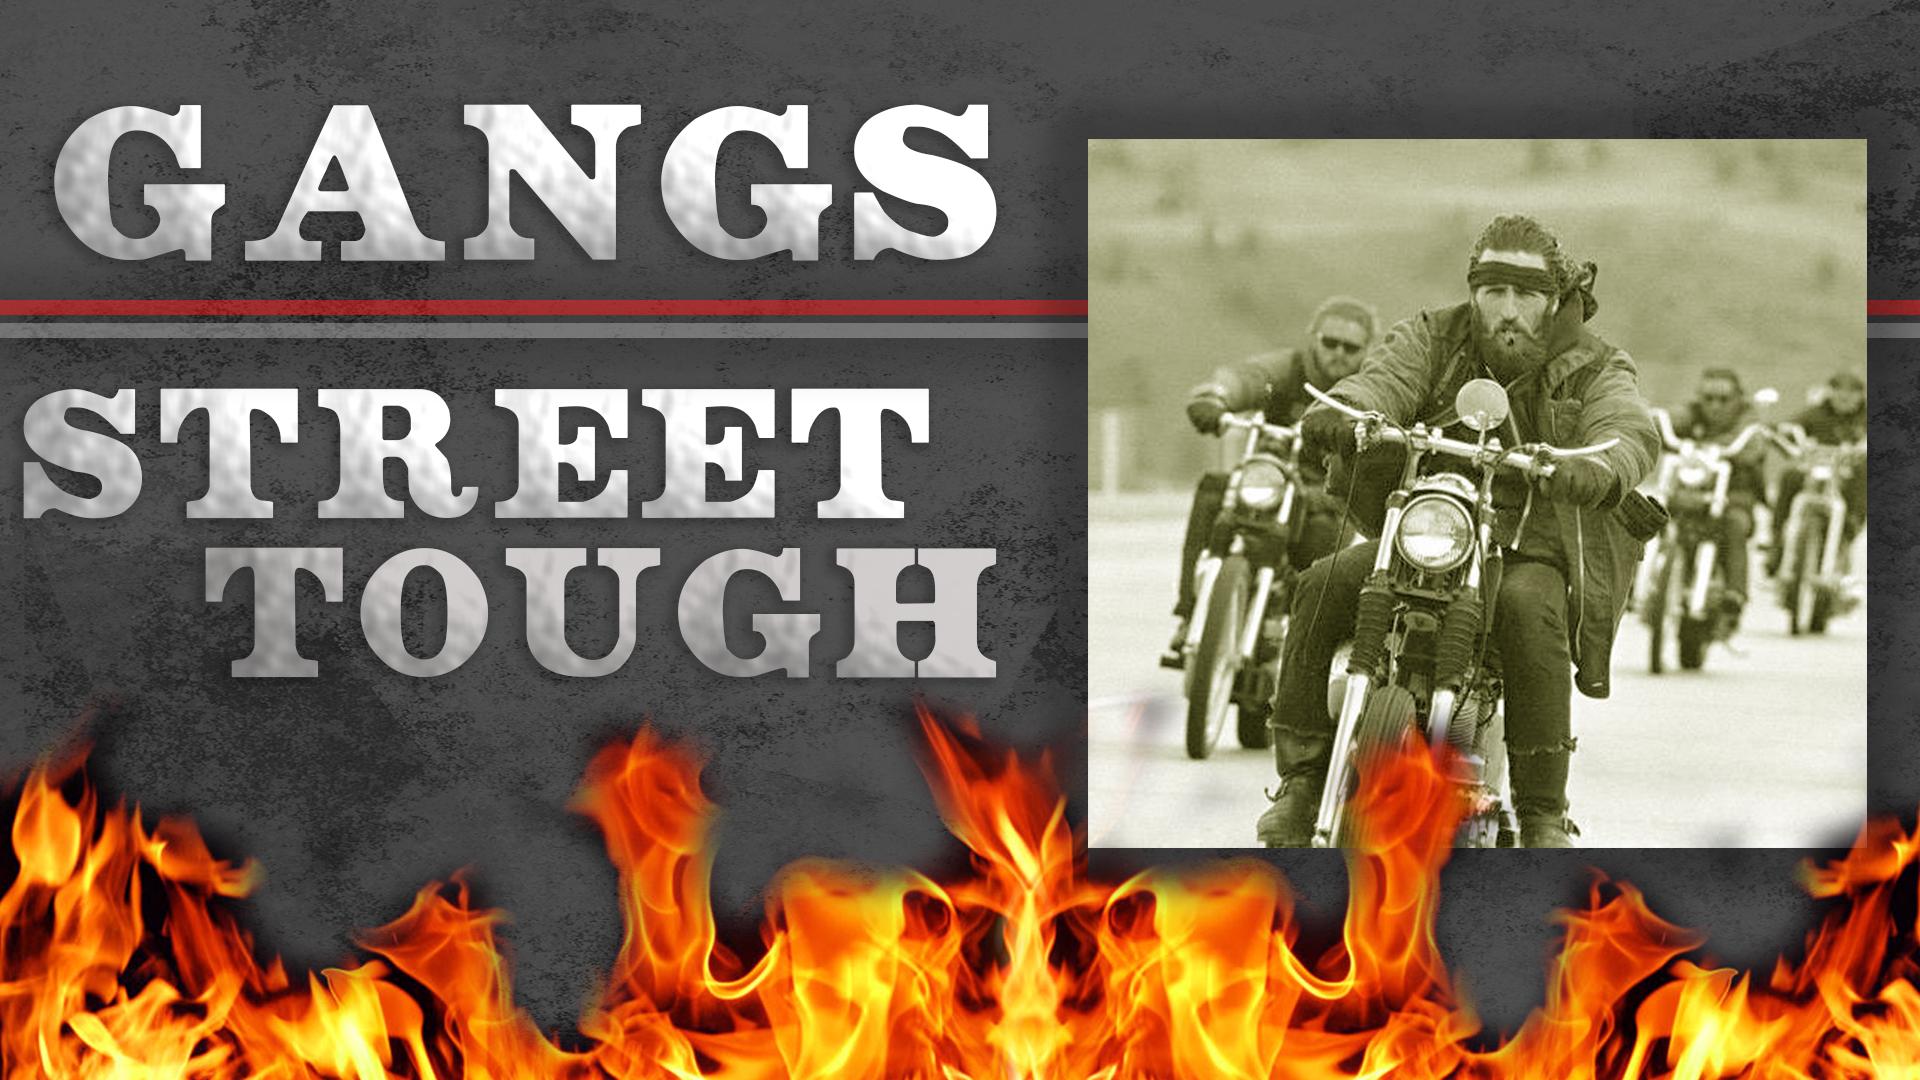 Gangs: Street Tough